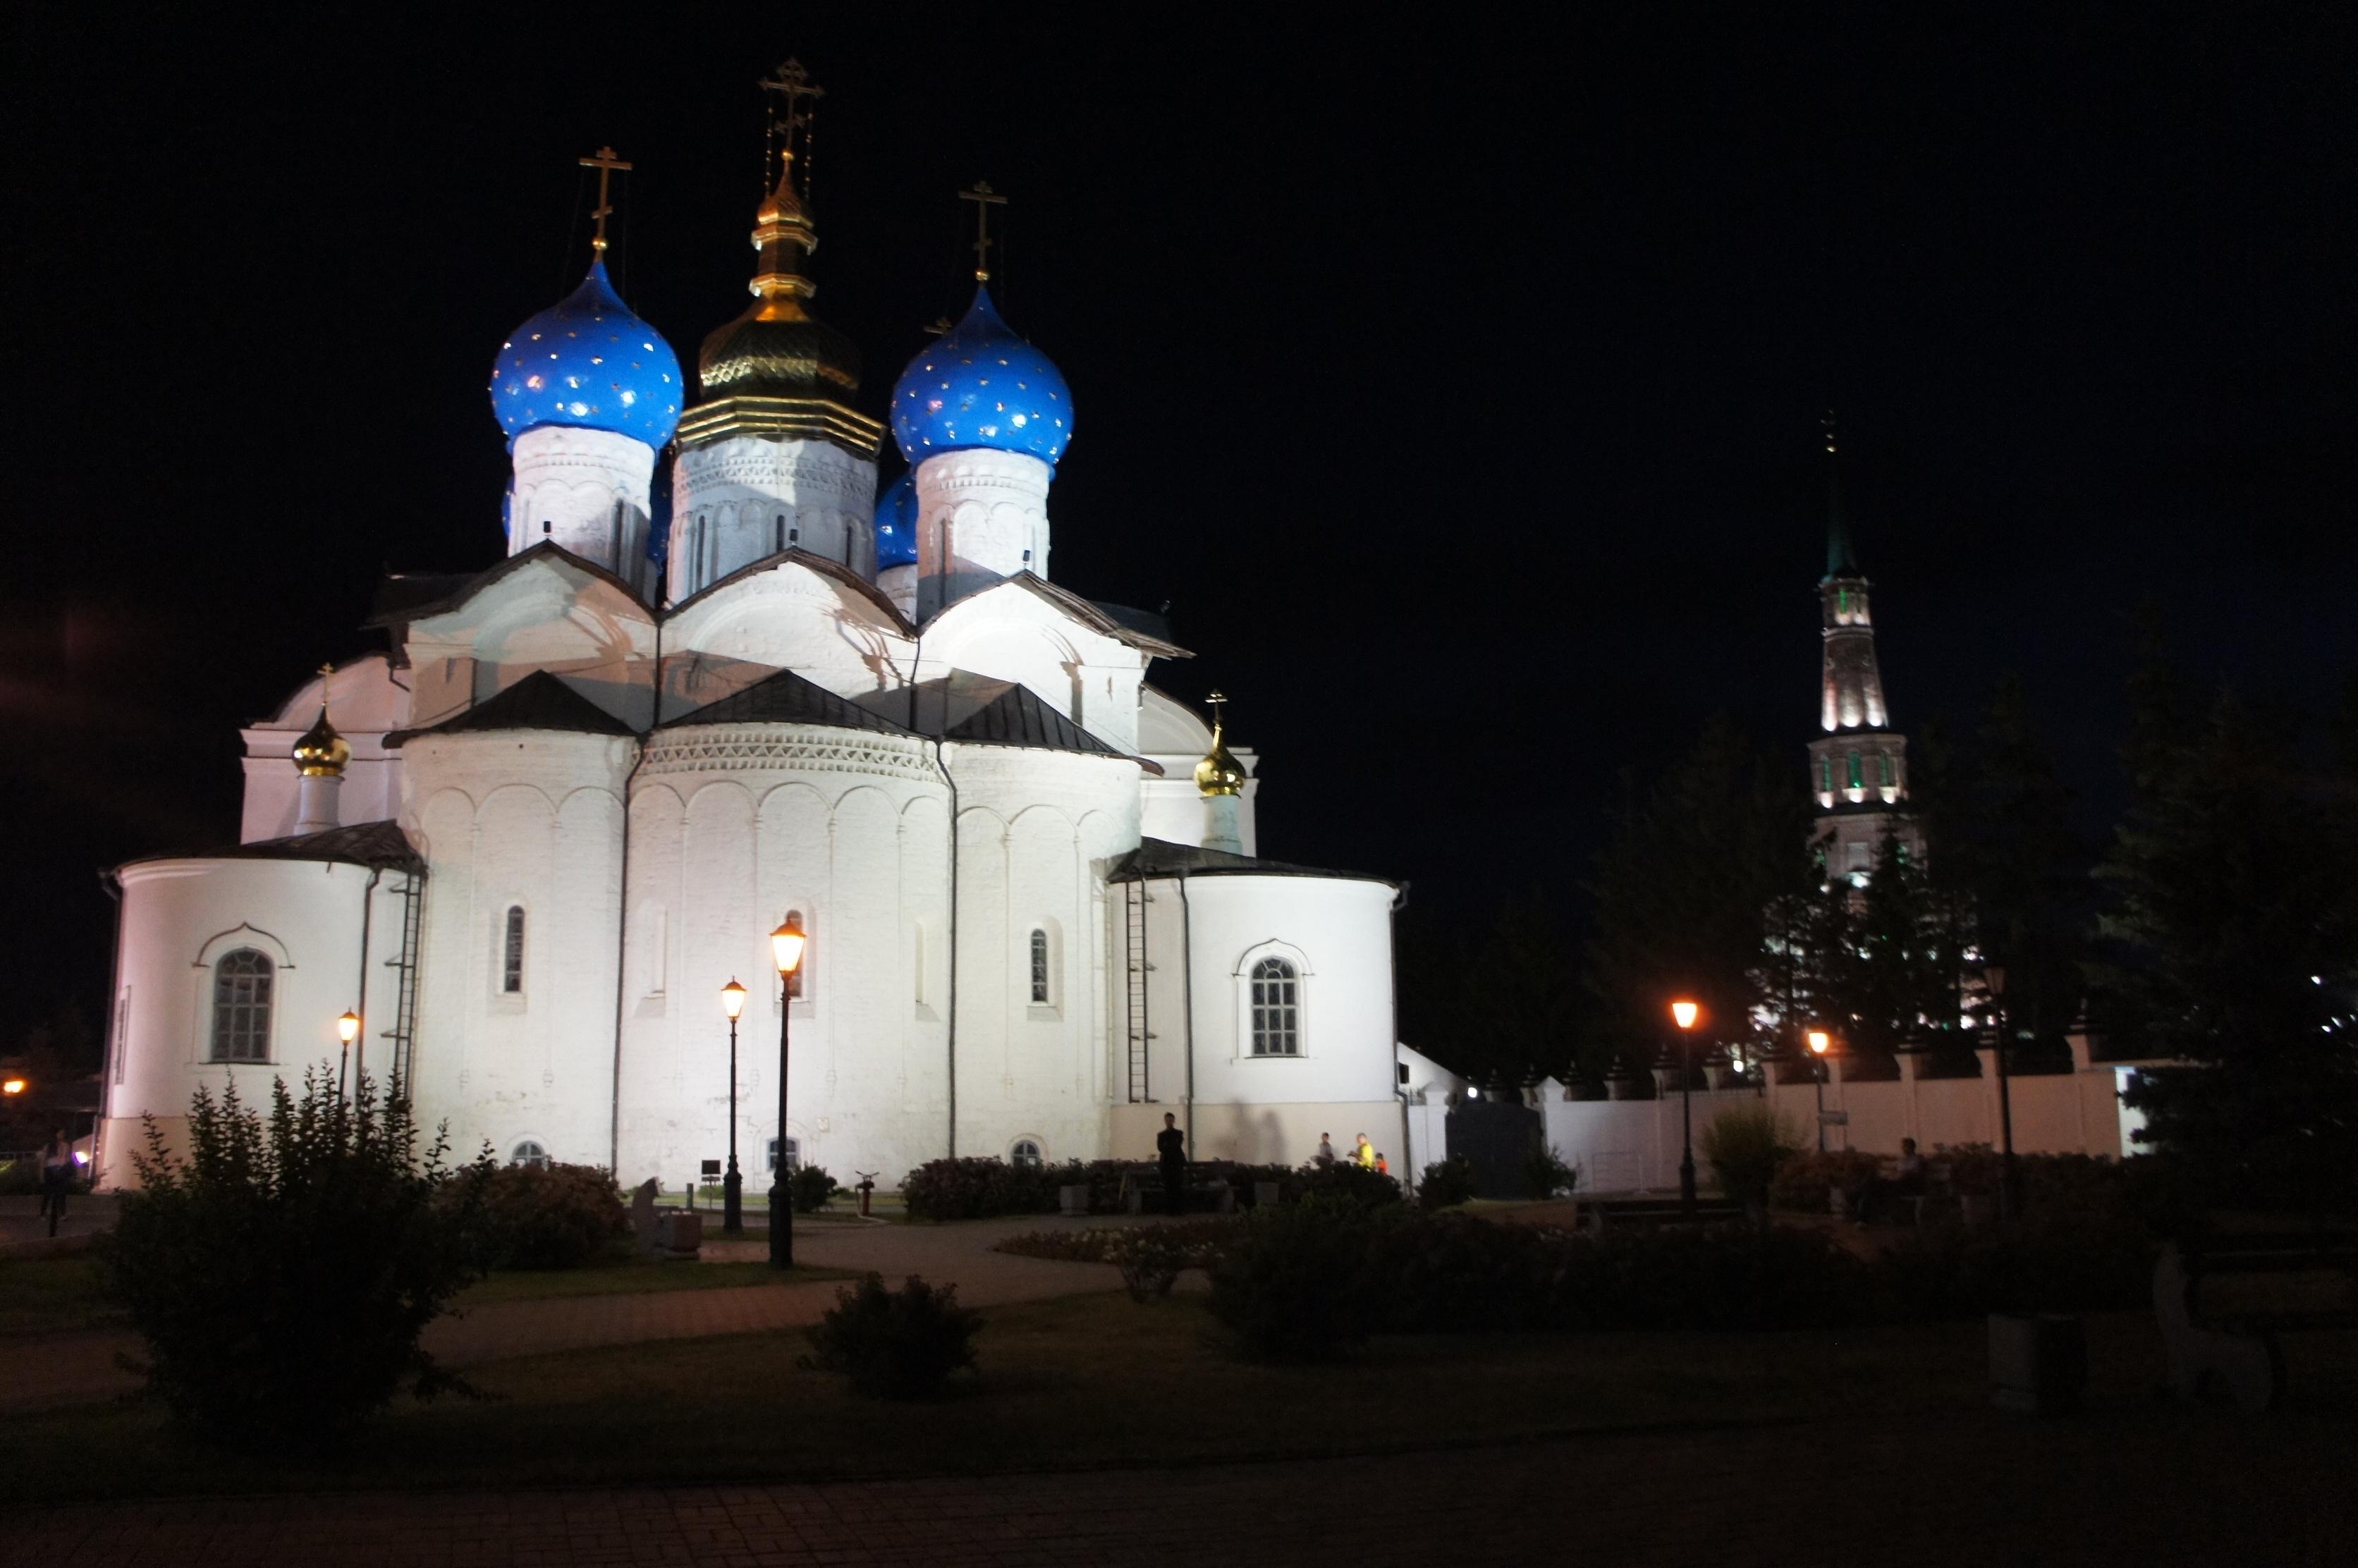 Bragoveschensky Cathedral